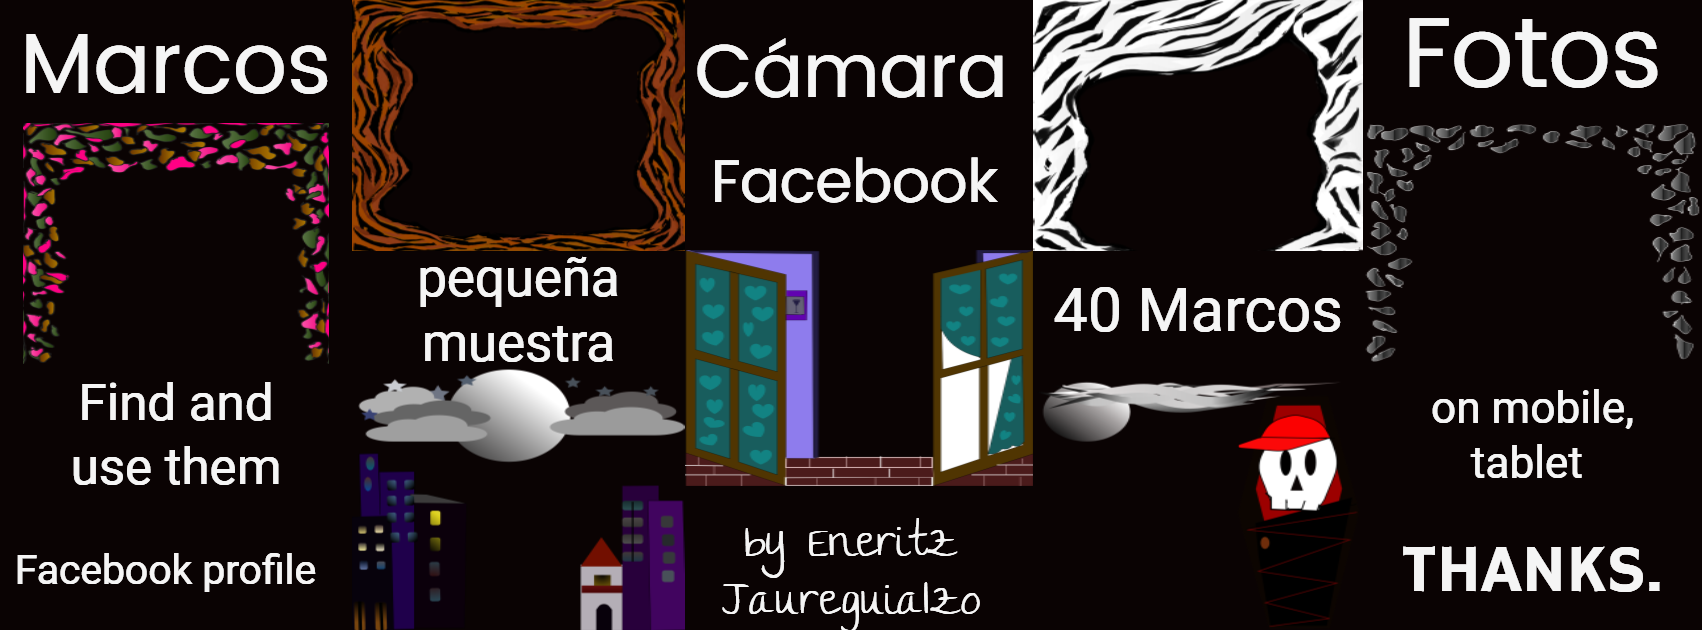 Marcos / Cámara / Fotos / Facebook / by Eneritz Jaureguialzo ...